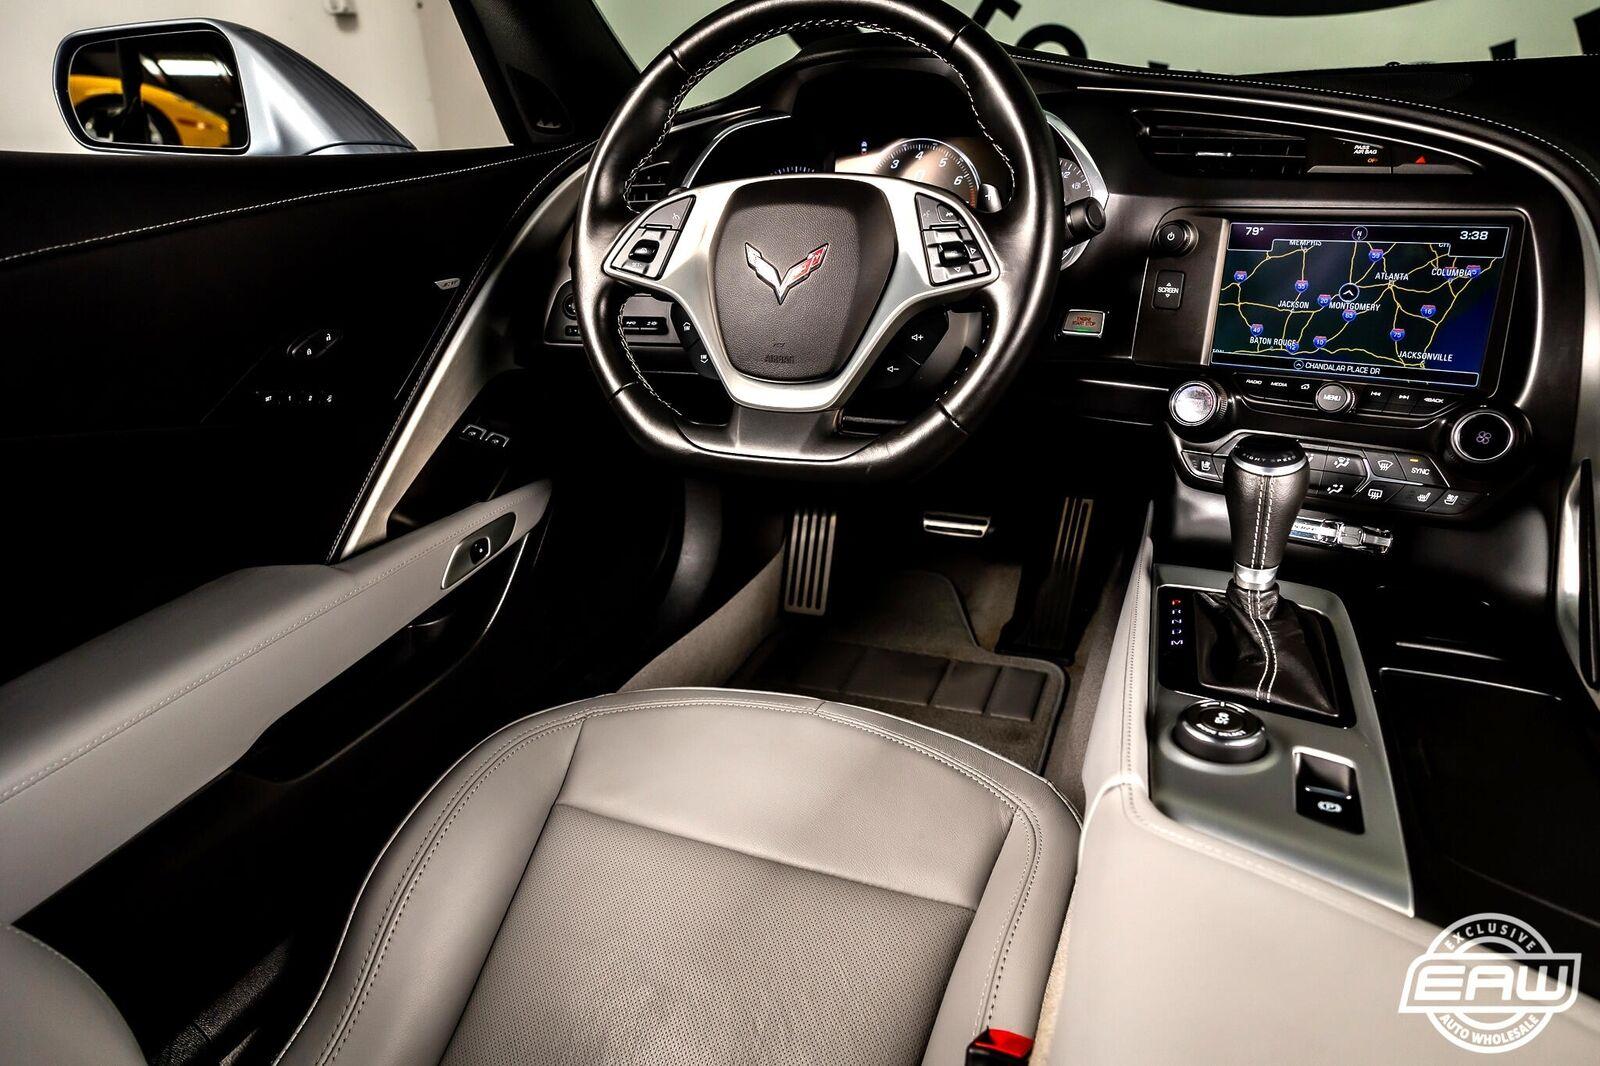 2017 Silver Chevrolet Corvette Grand Sport 2LT | C7 Corvette Photo 7